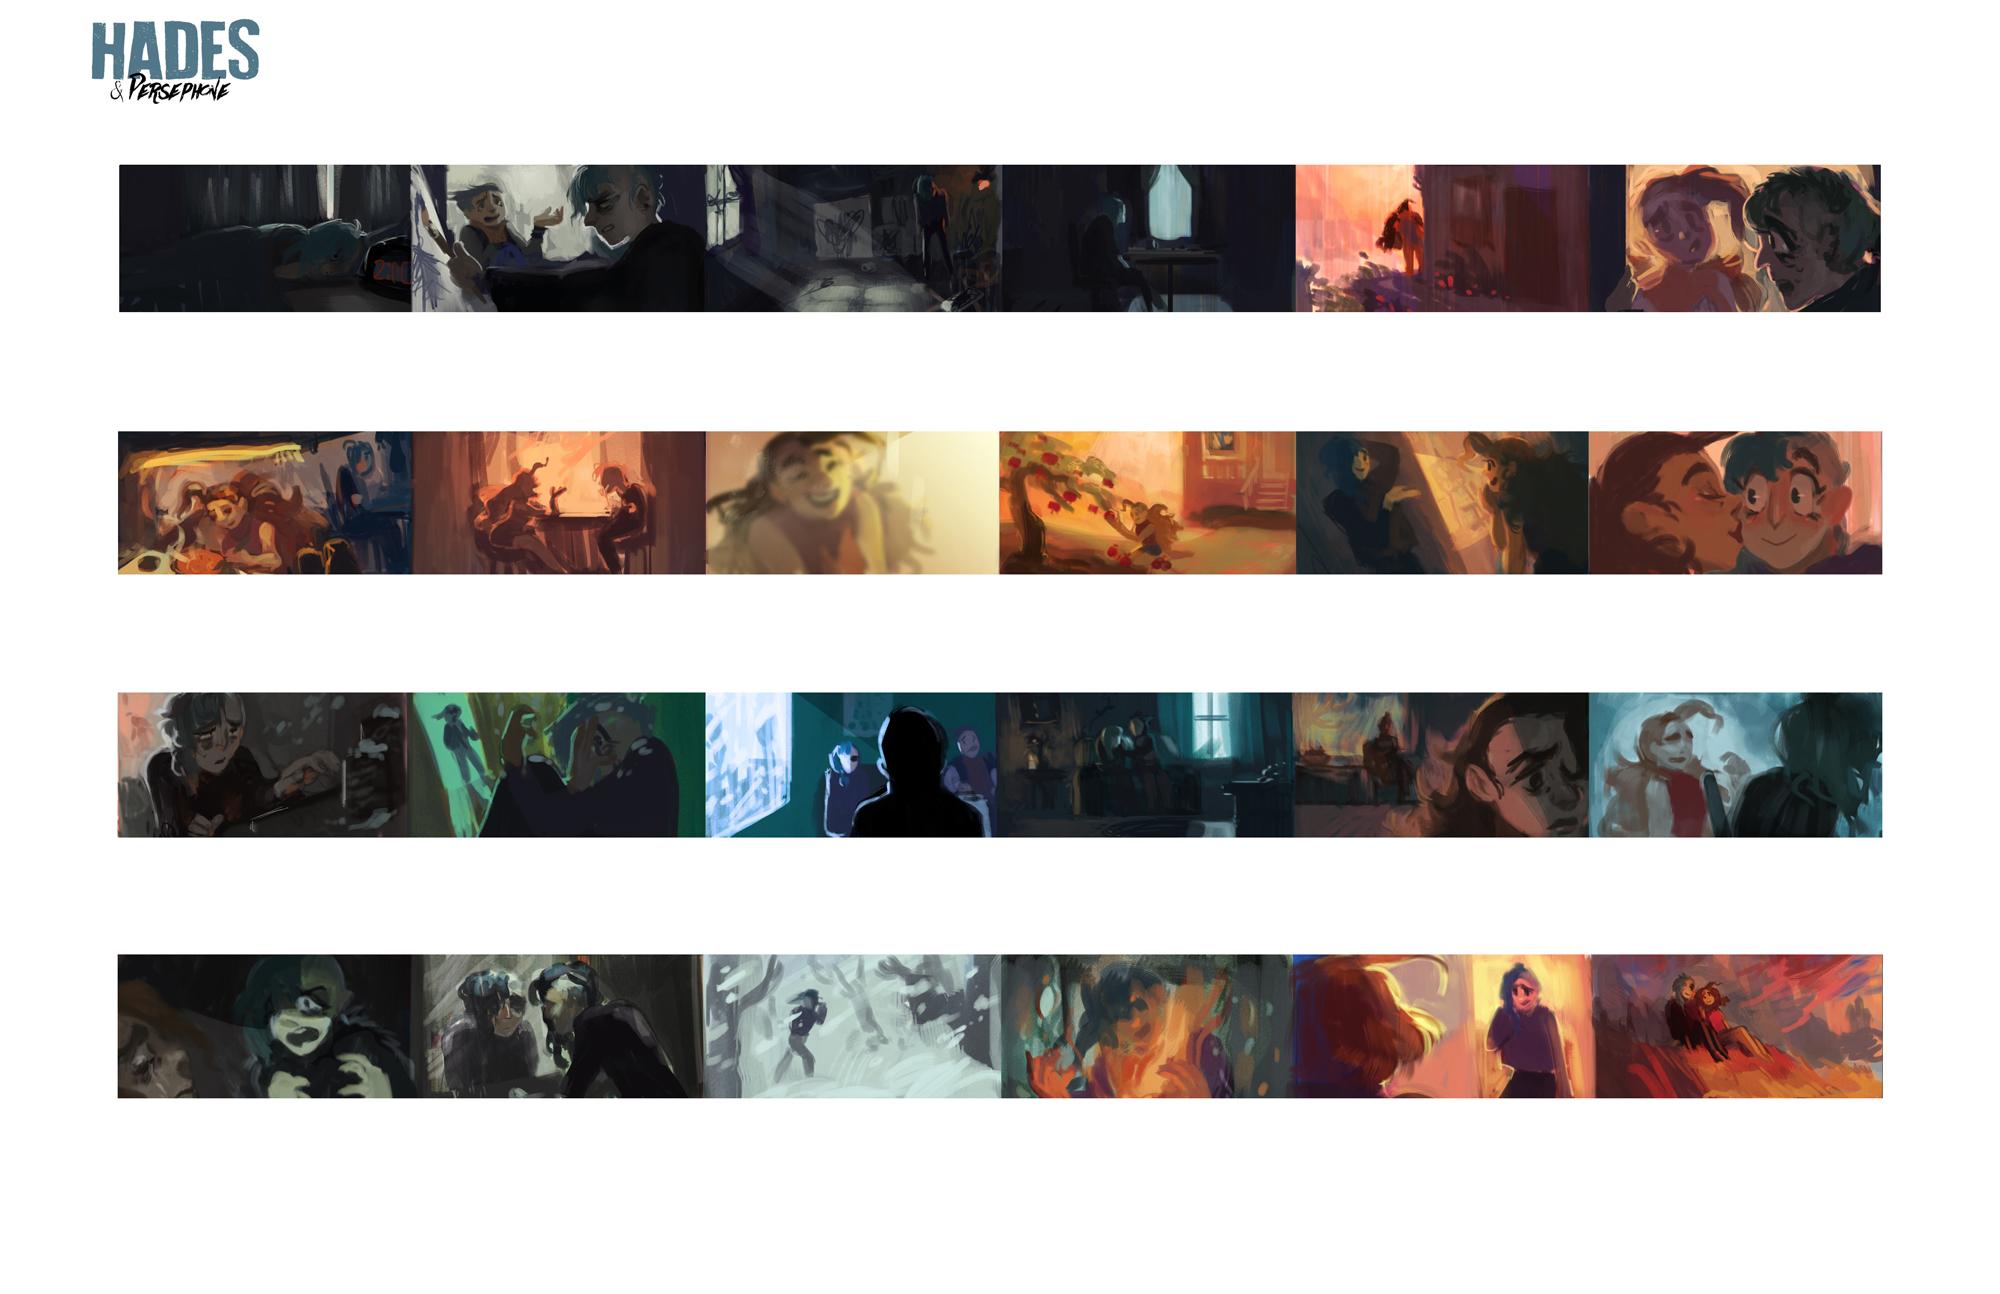 10hades colorscript011.jpg